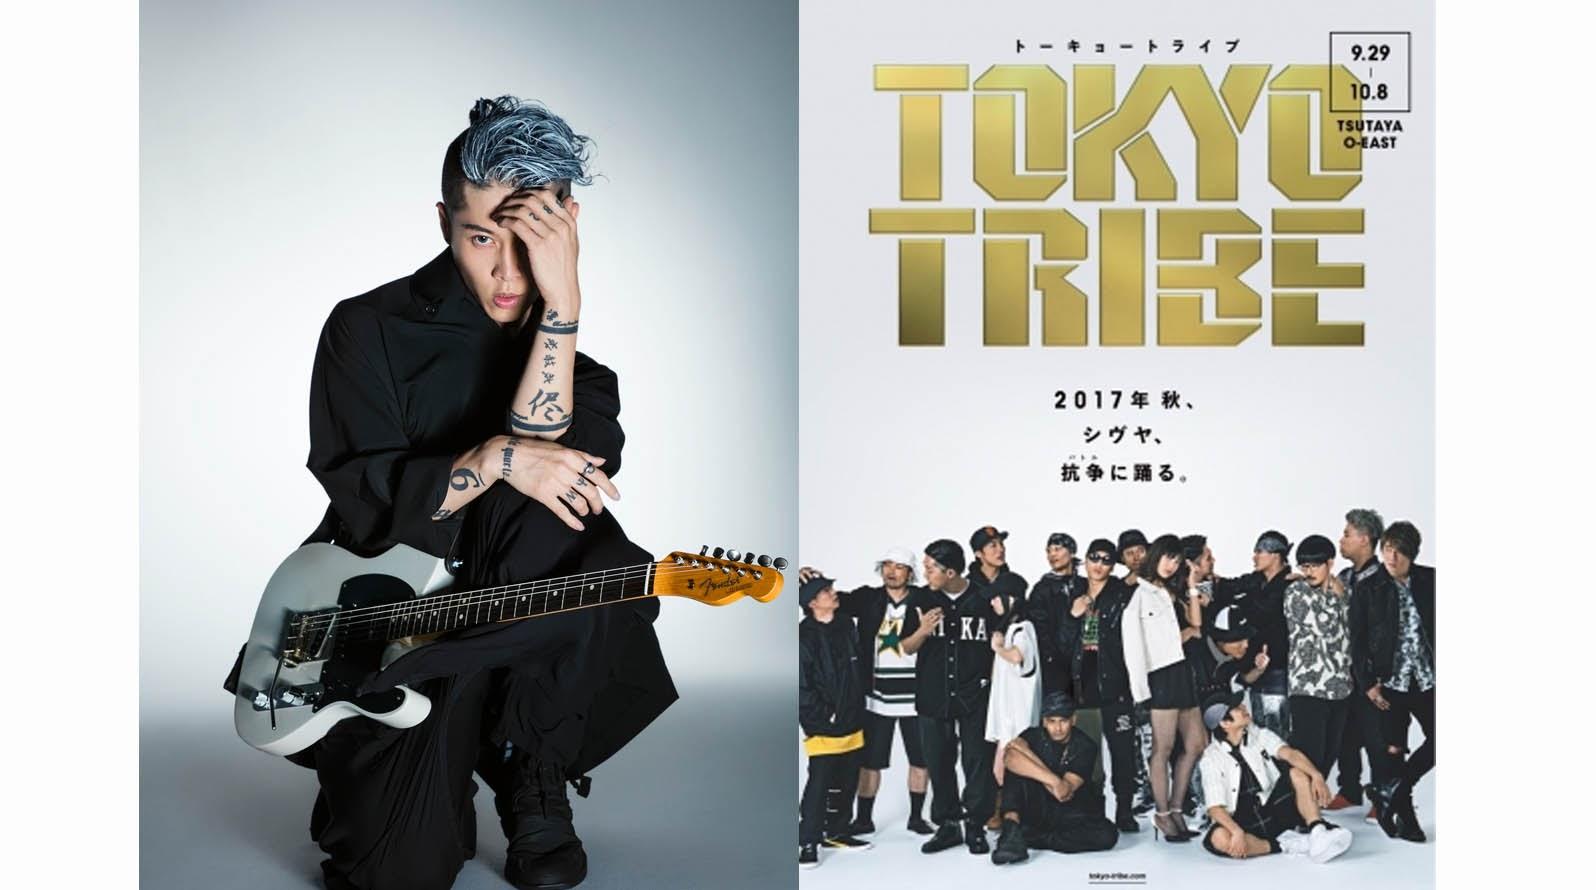 MIYAVI與SKY-HI(AAA日高光啓)合作曲成為「TOKYO TRIBE(東京暴族)」主題曲